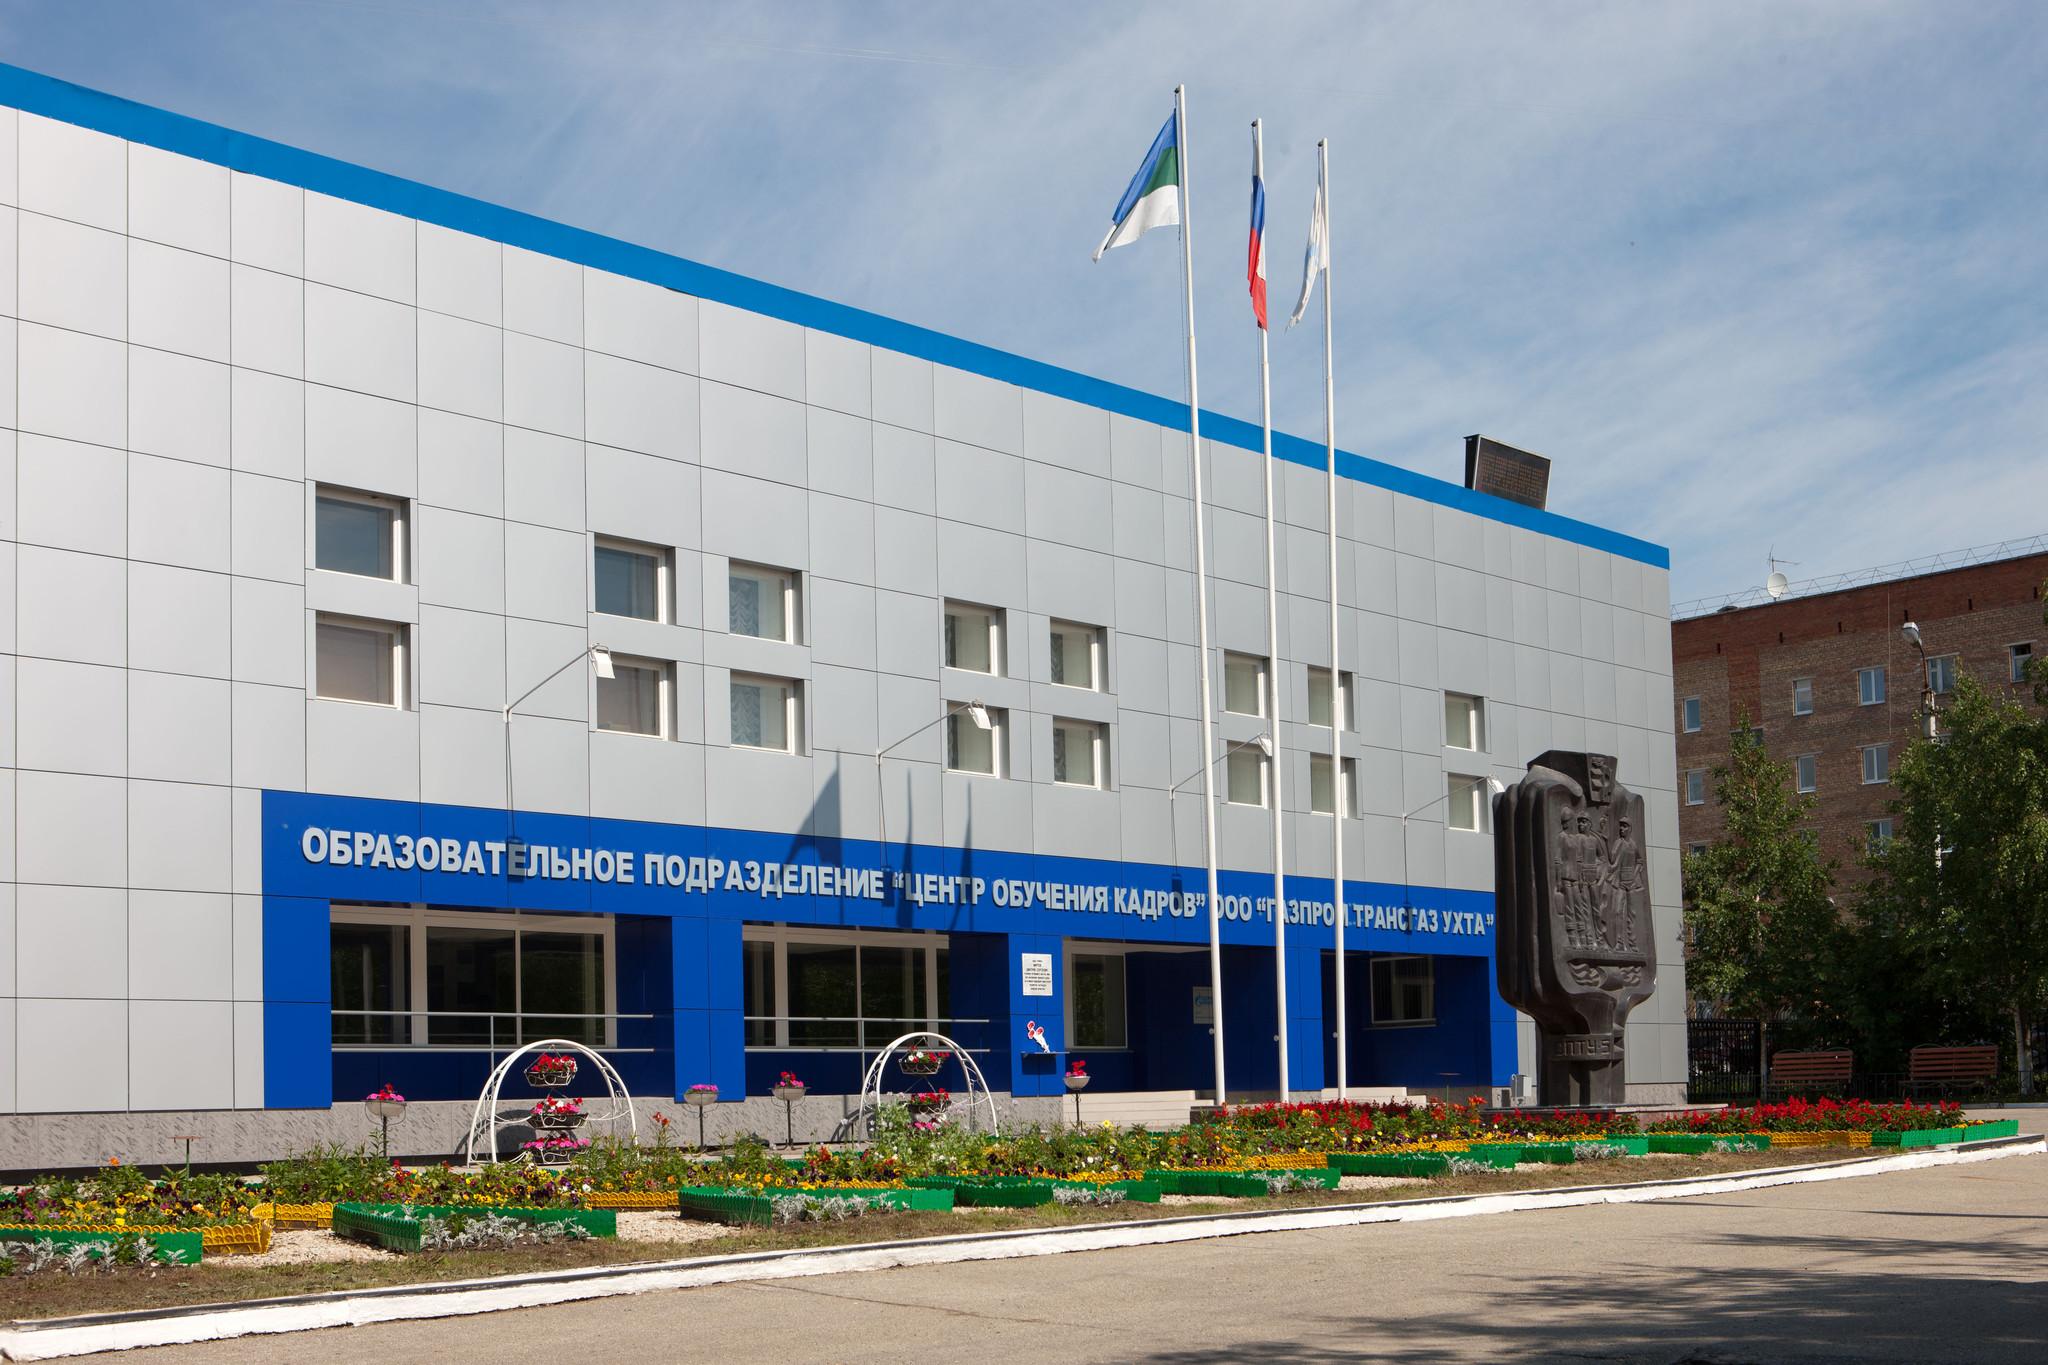 Гаспром транс газ